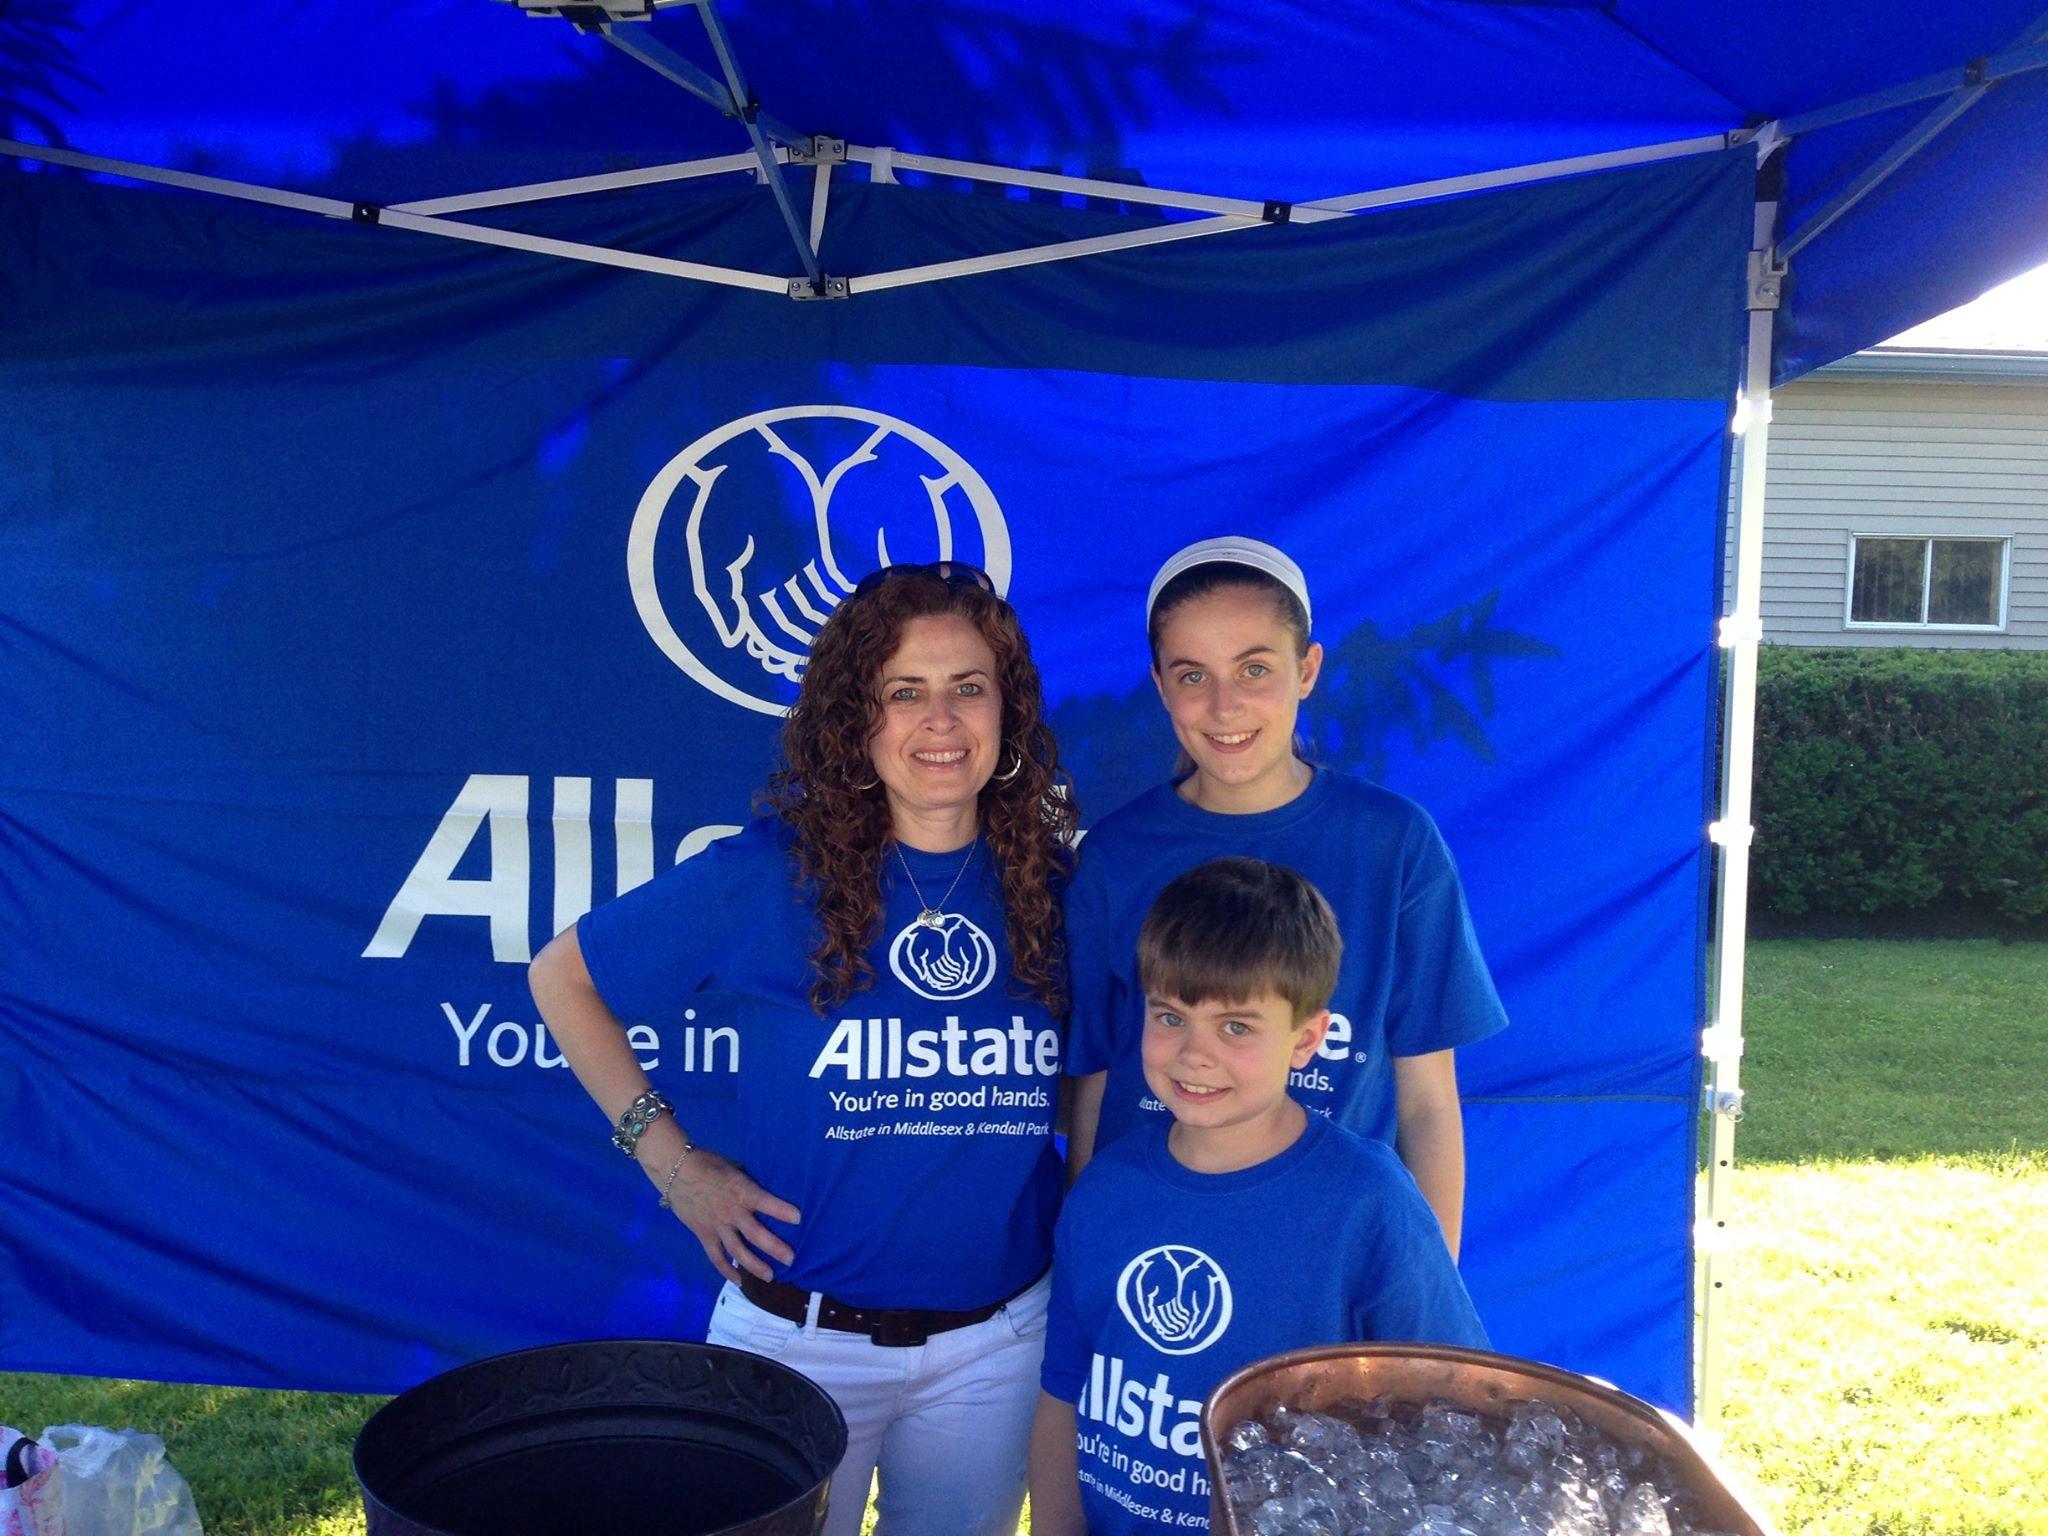 David Basile: Allstate Insurance image 20